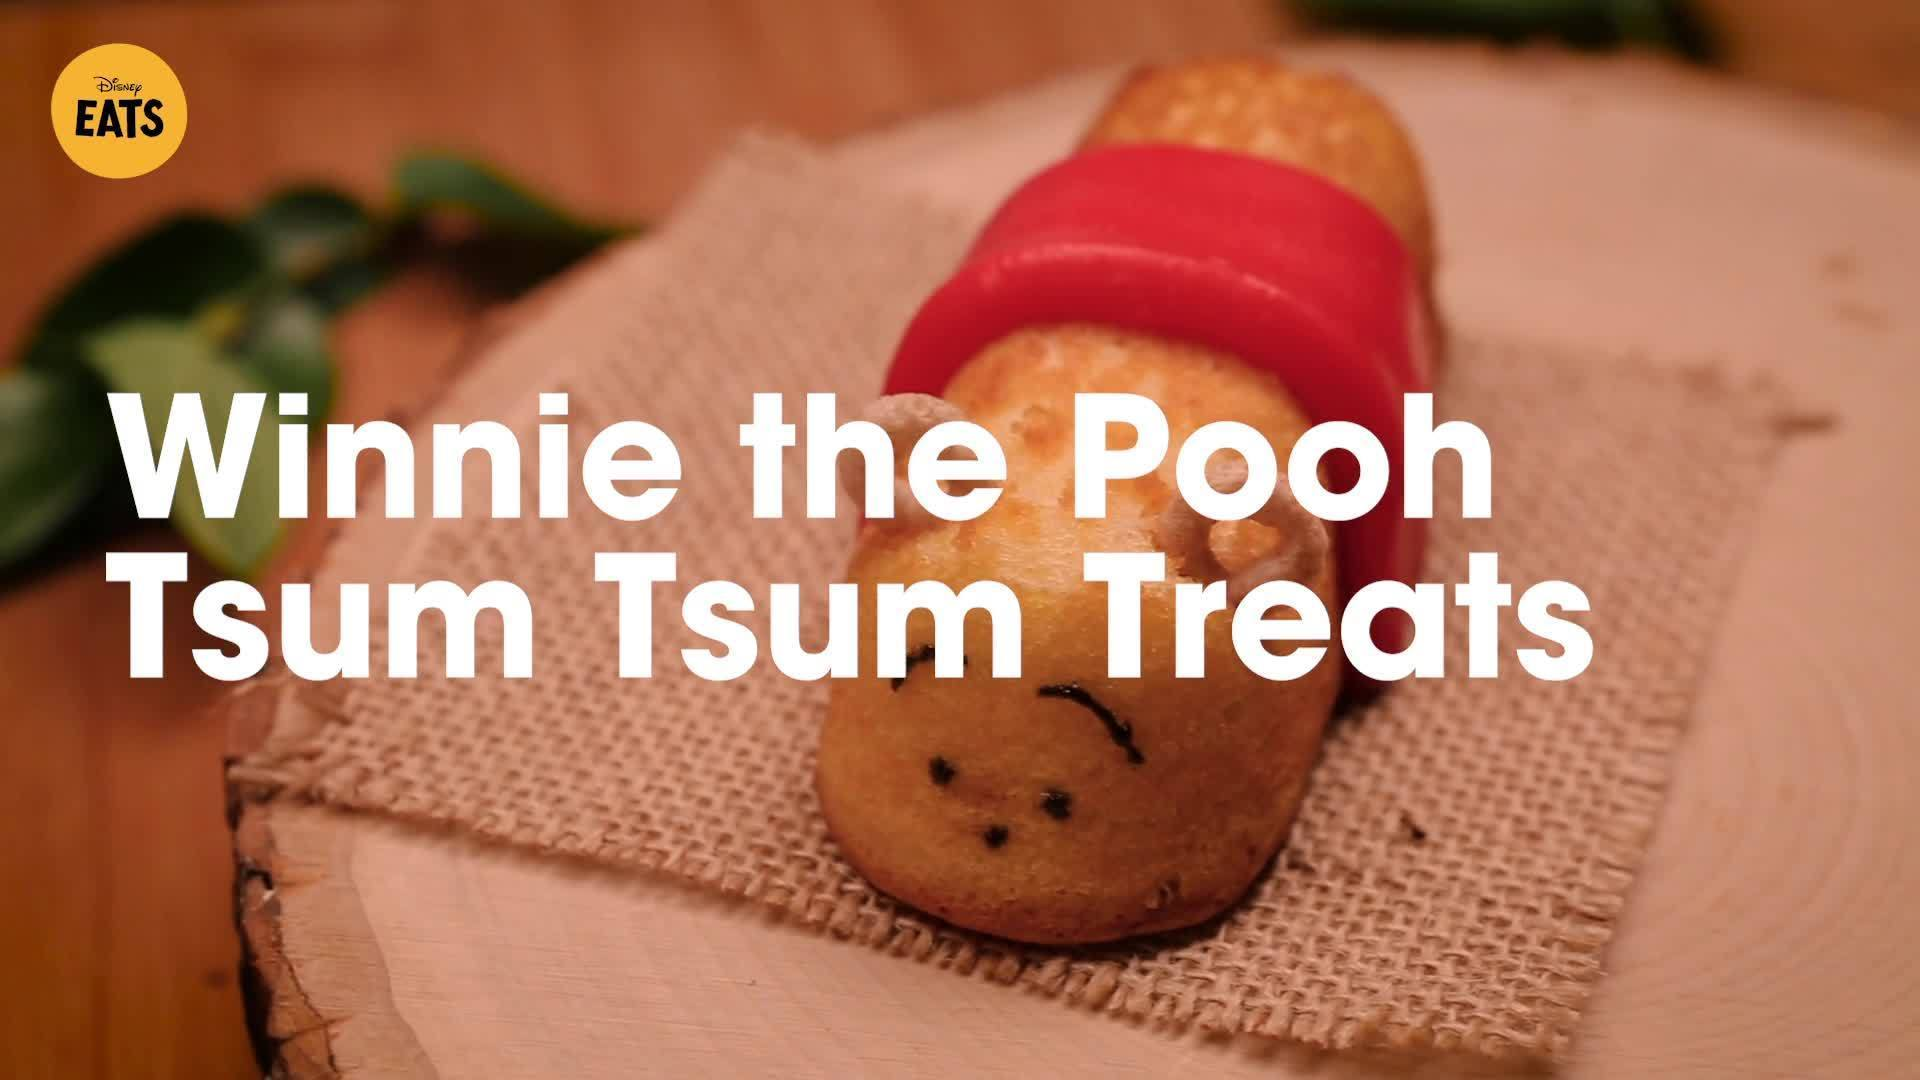 Winnie the Pooh Tsum Treats | Disney Eats